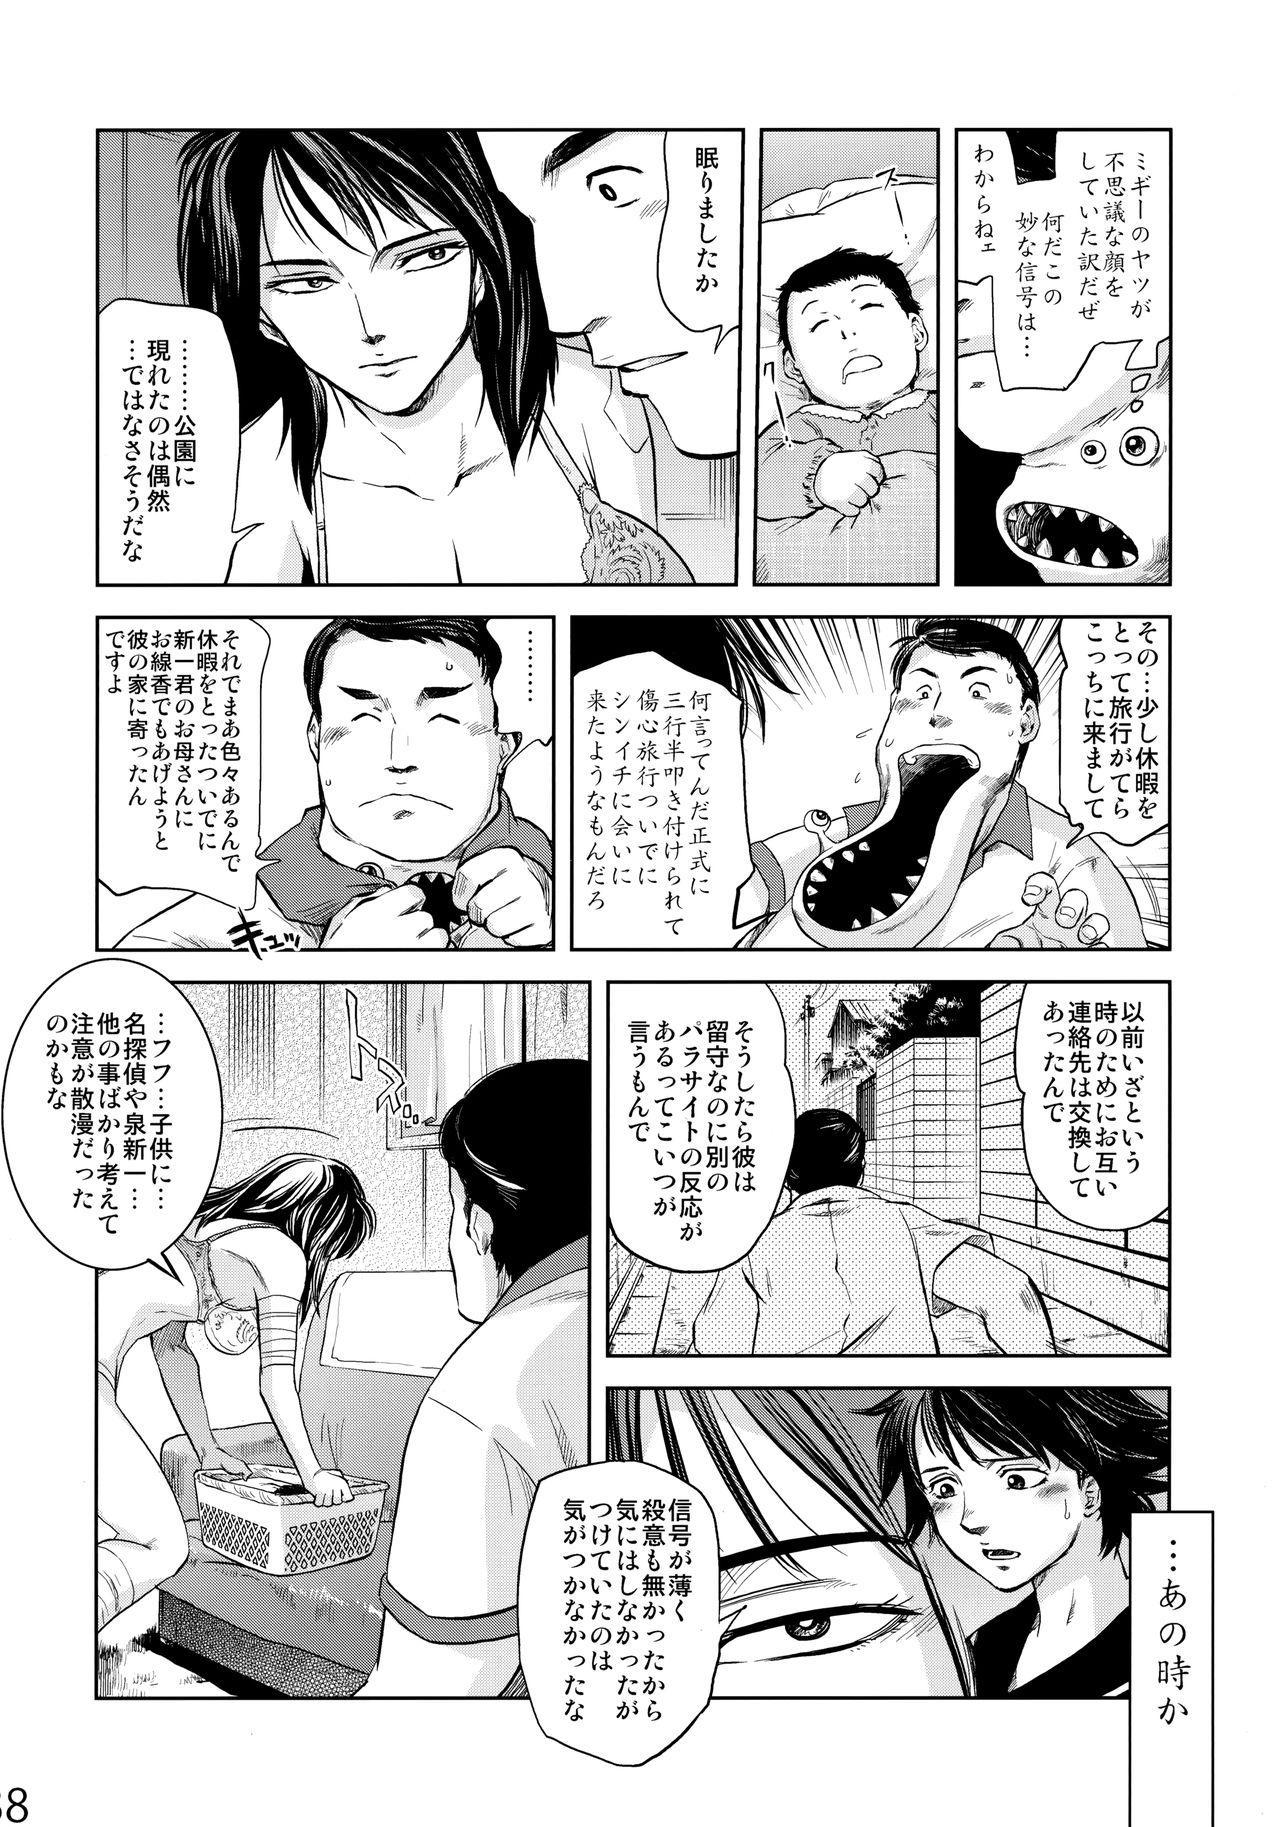 Yomeiri 36